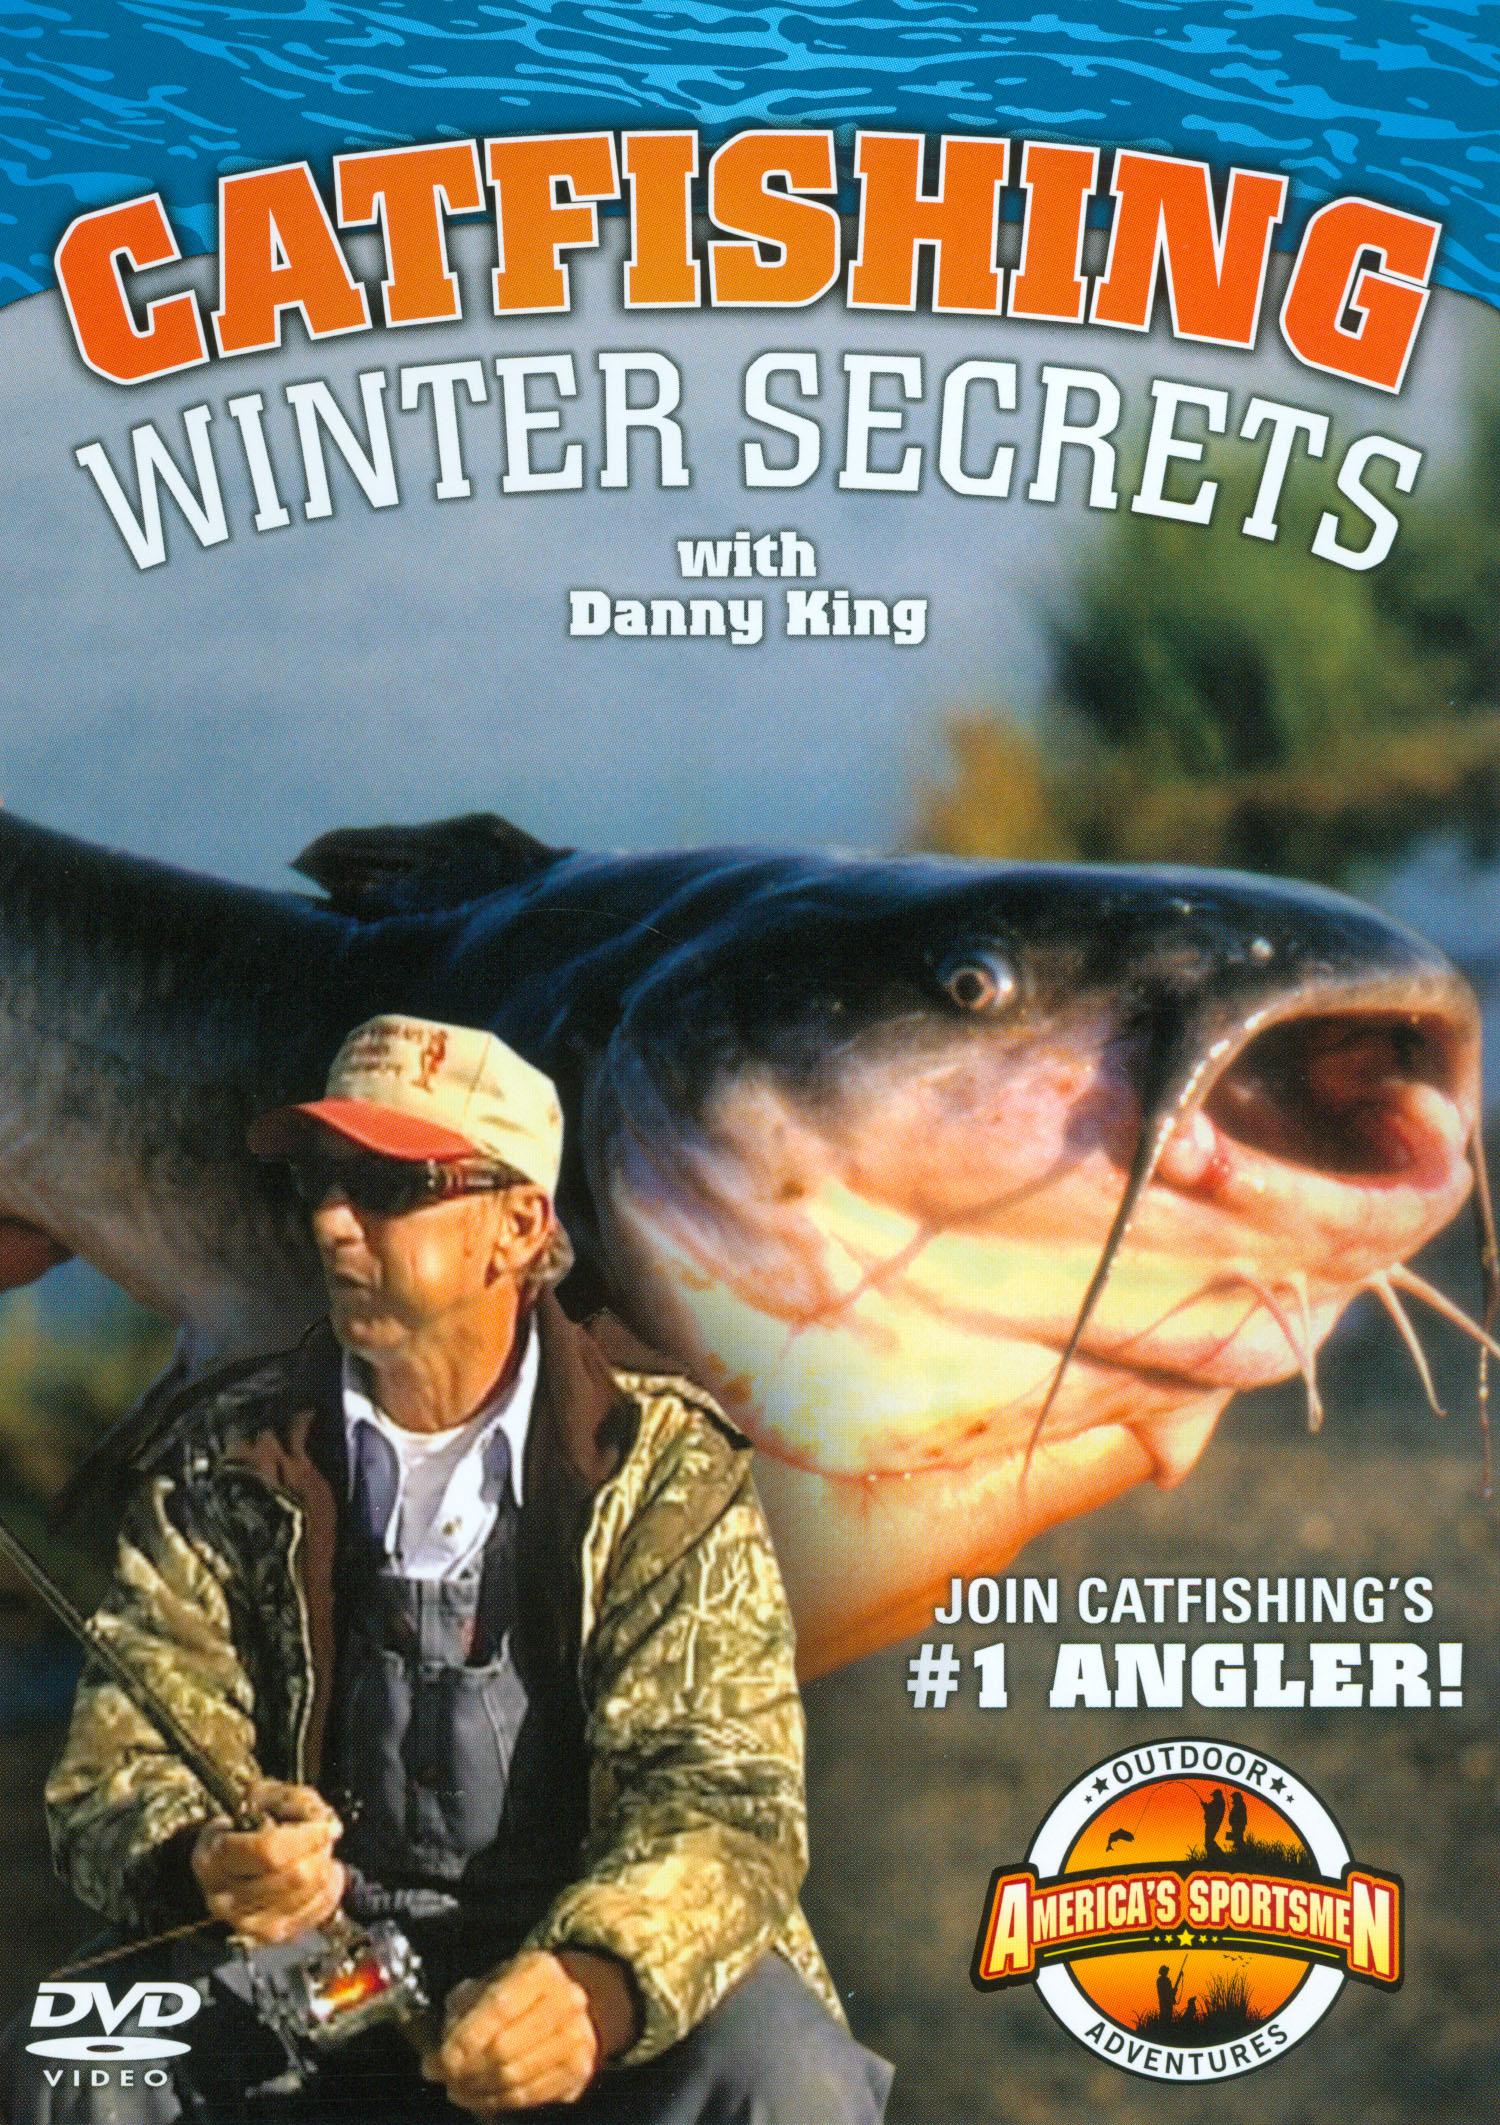 Catfishing: Winter Secrets with Danny King